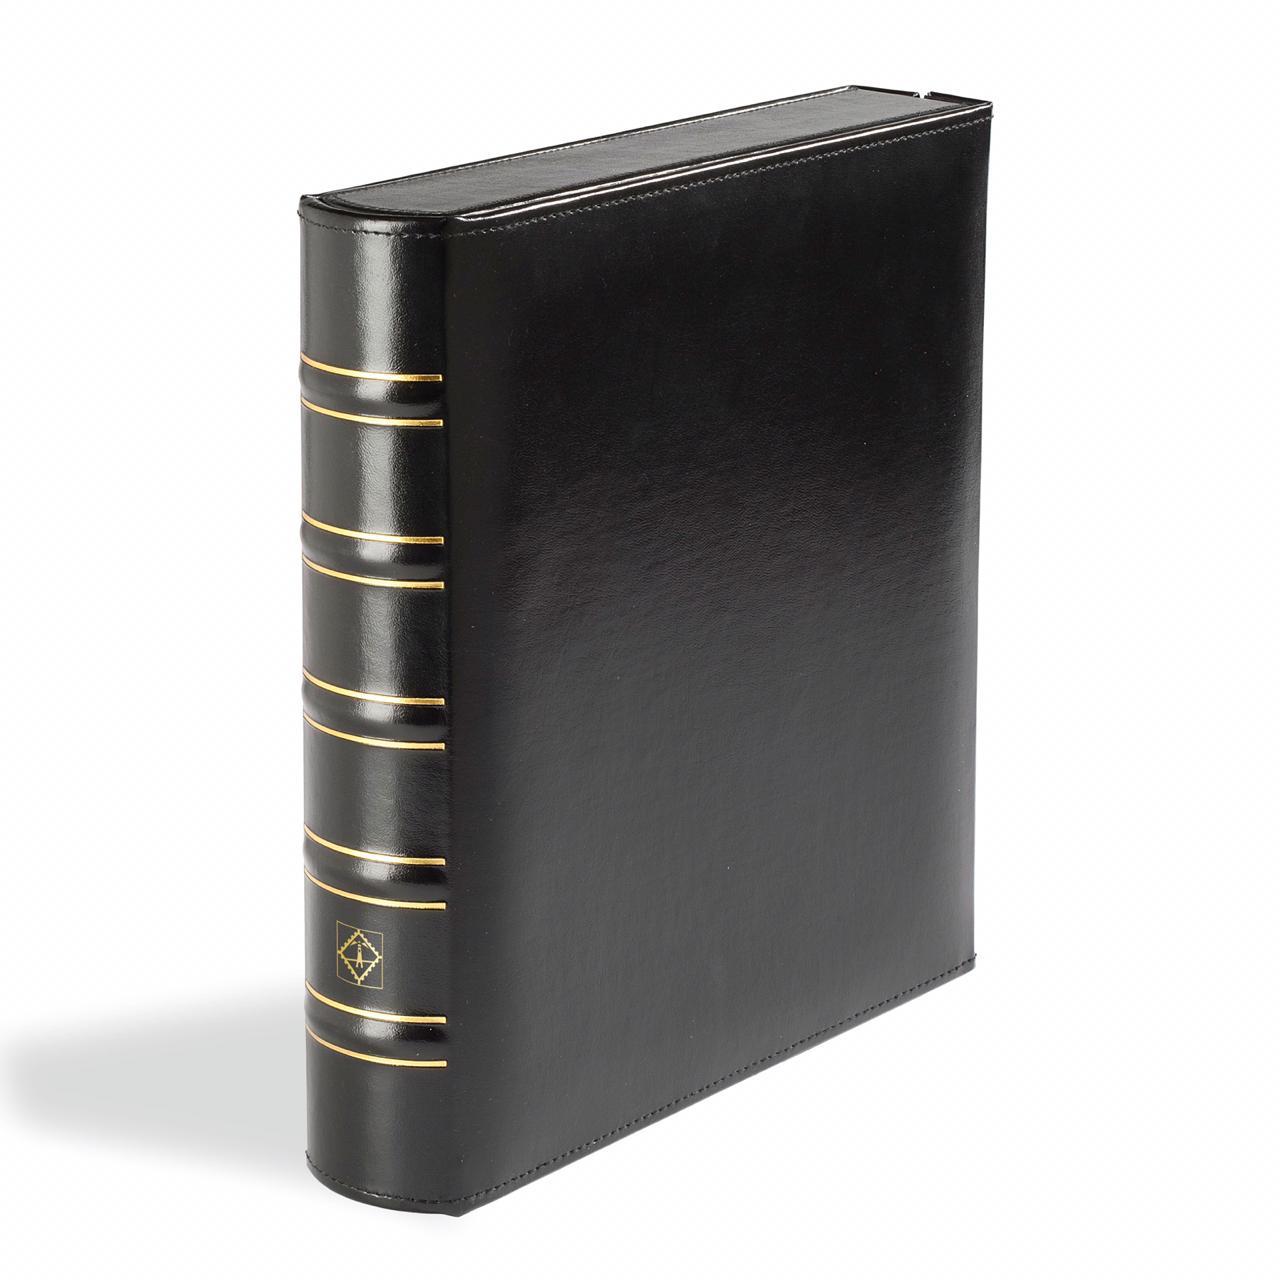 Álbum Leuchtturm Classic OPTIMA Box com fechadura